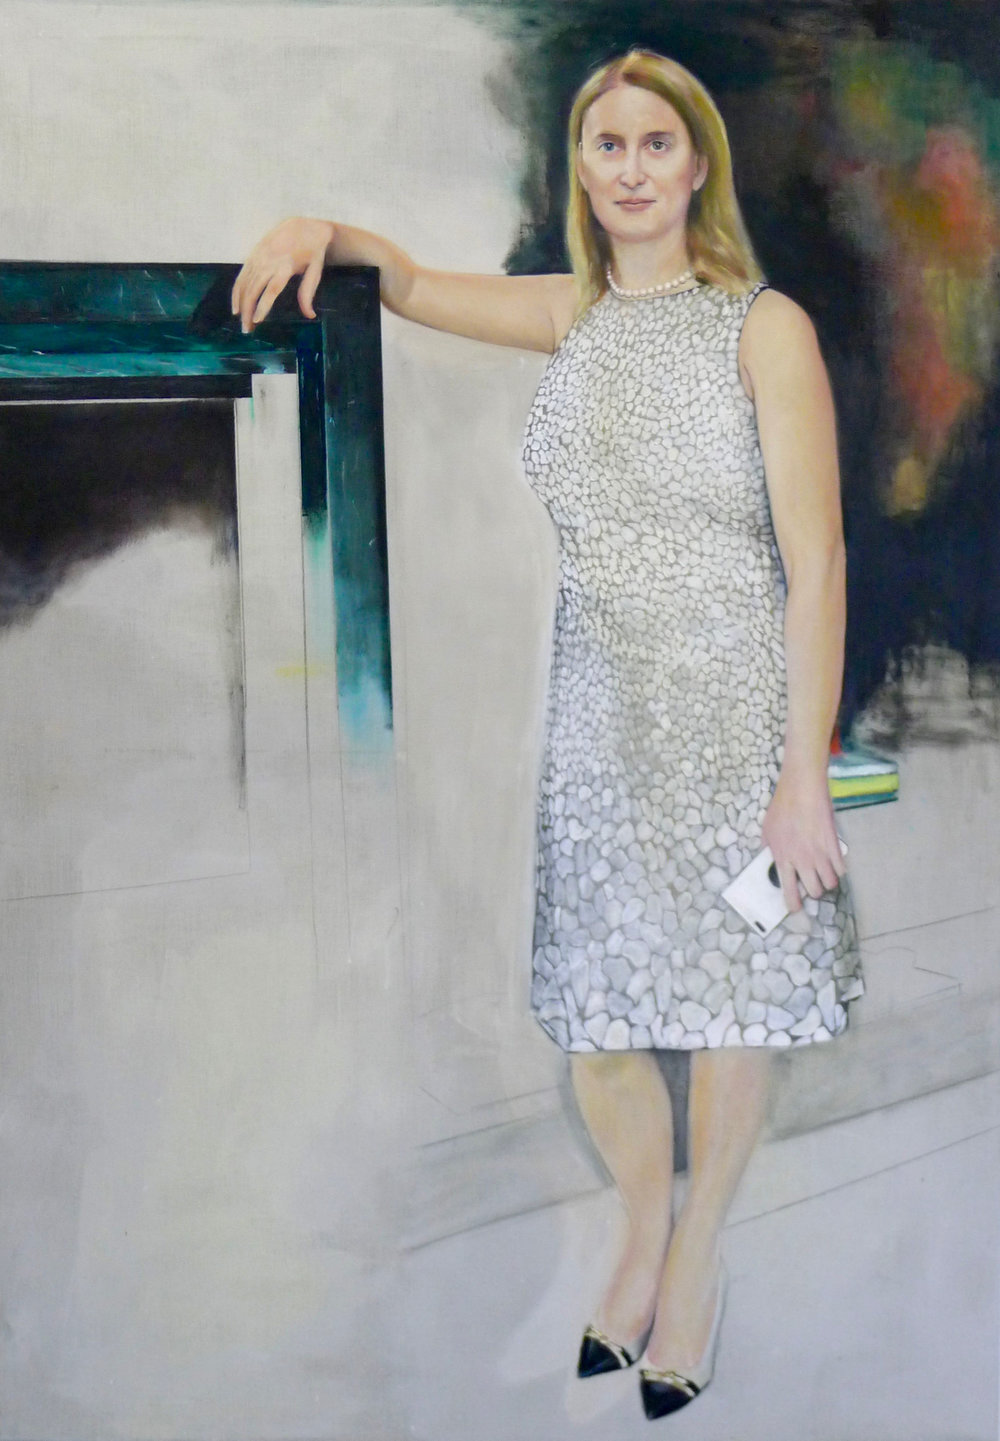 Ms Bea Knecht, oil on canvas, 200x140cm, 2018/19